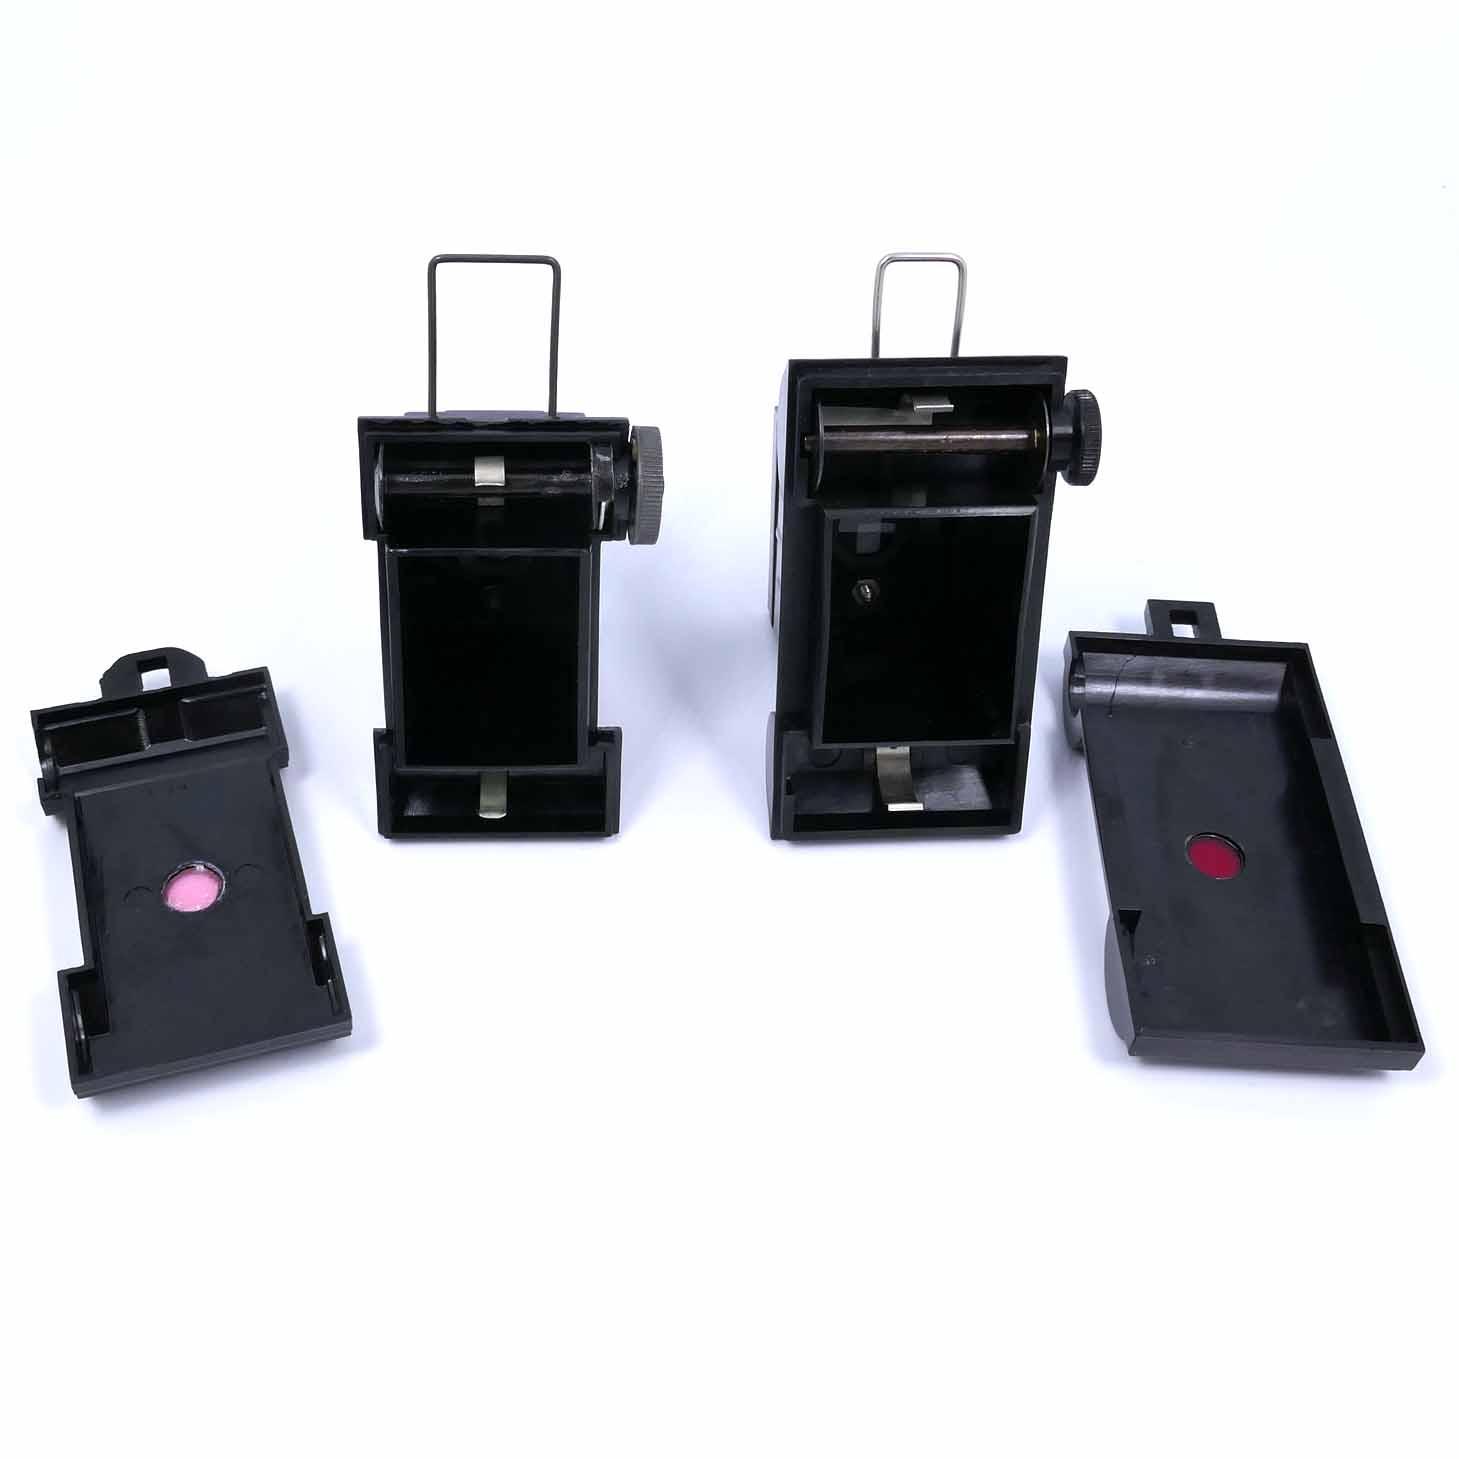 clean-cameras-Univex-A+Rower-03